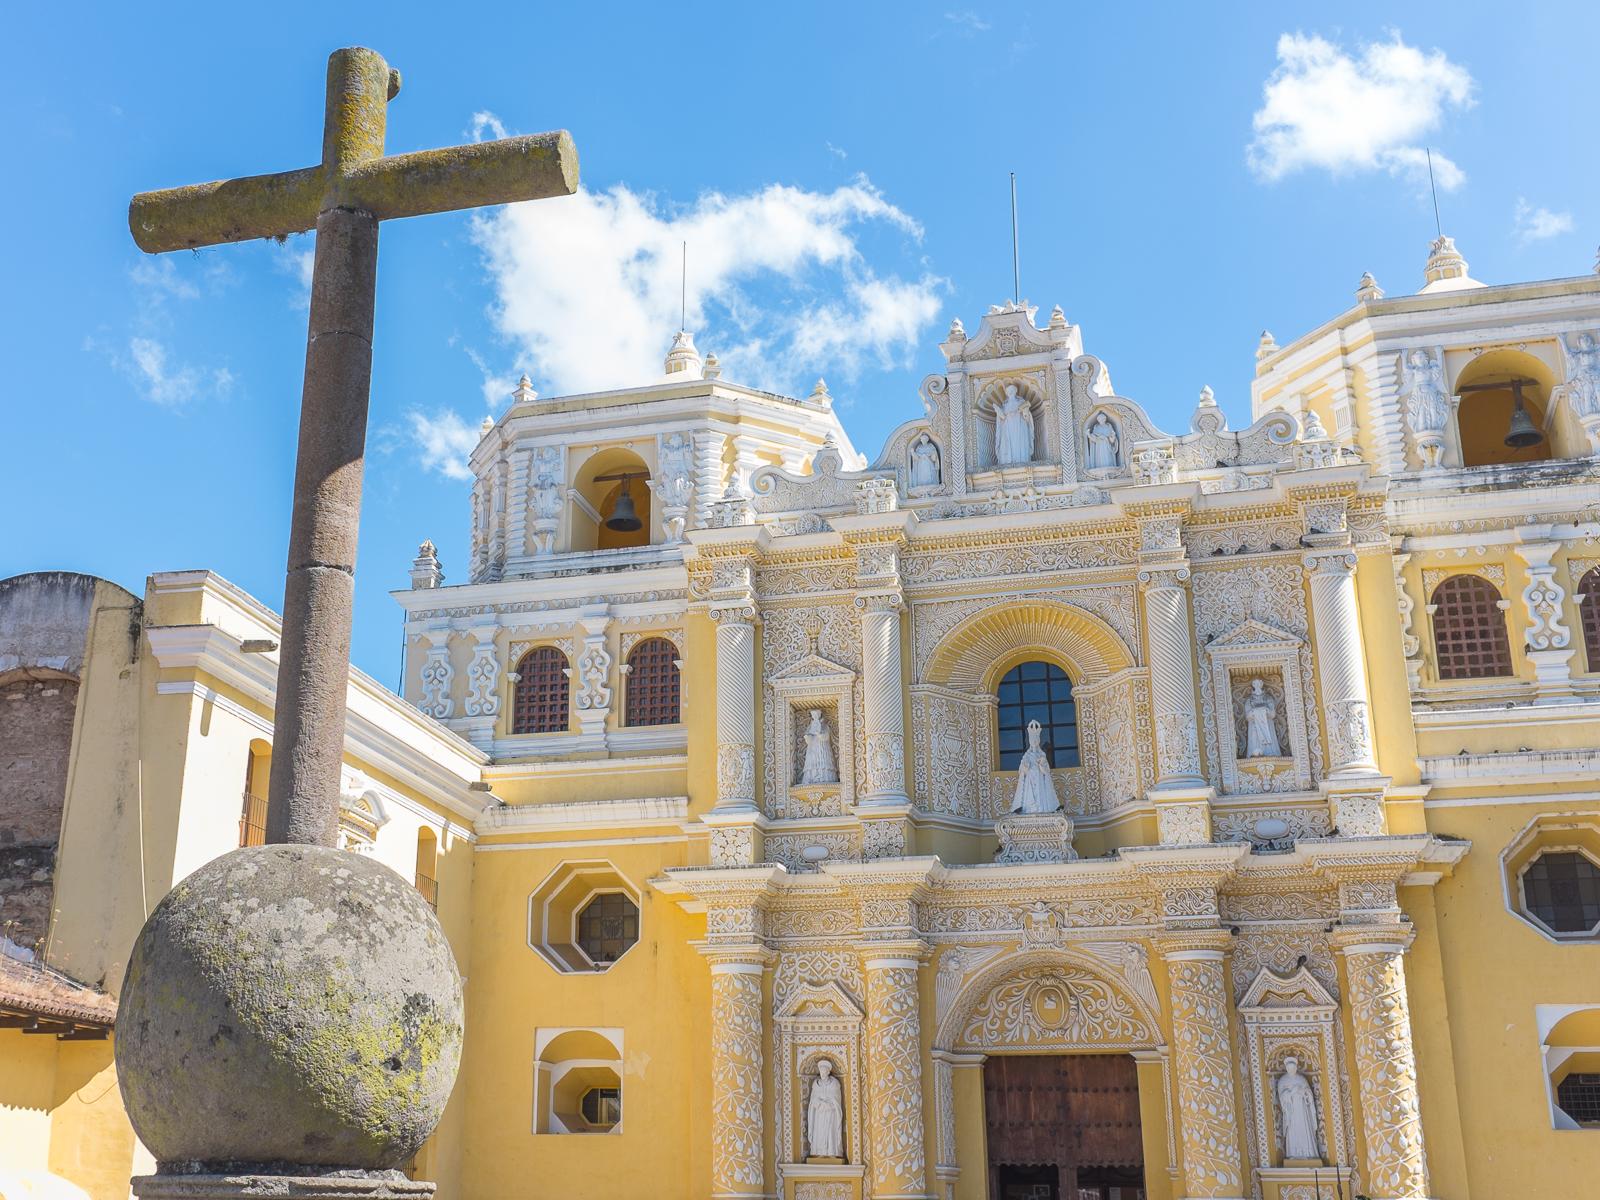 Antigua Guatemala a World Heritage Site by UNESCO, Main Plaza